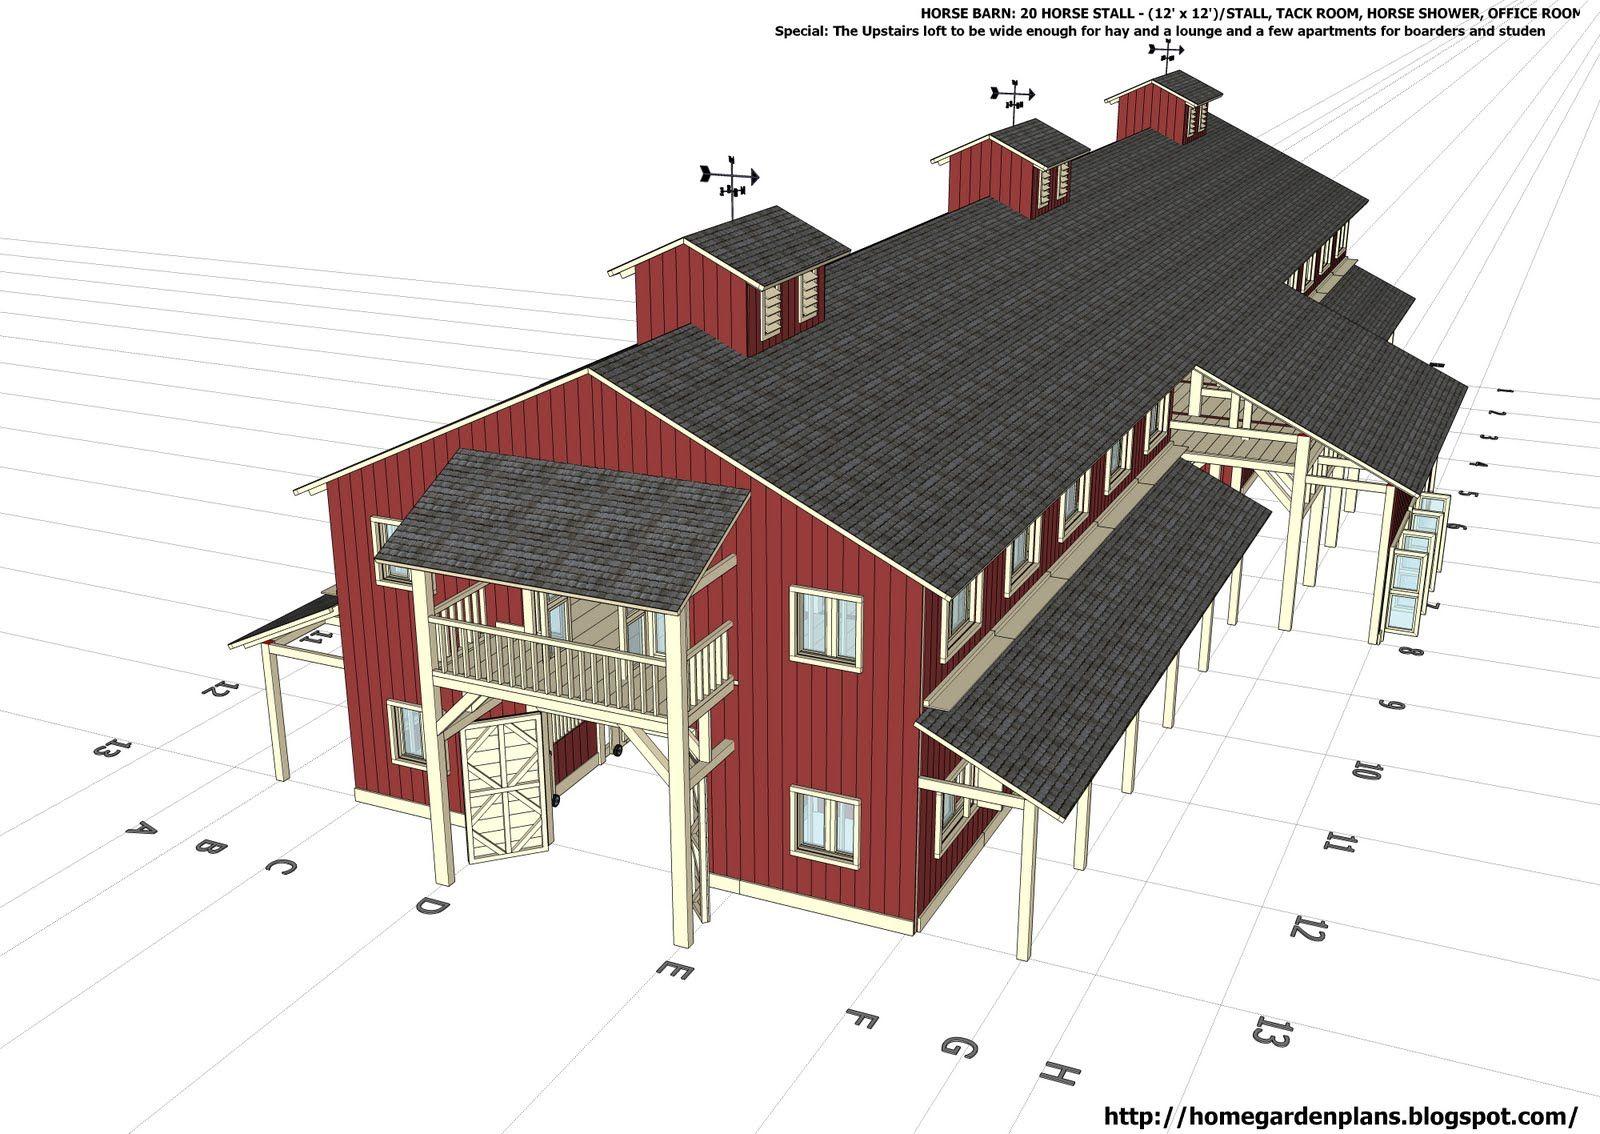 home garden plans: Horse Barns | horse trailer | Pinterest | Horse ...